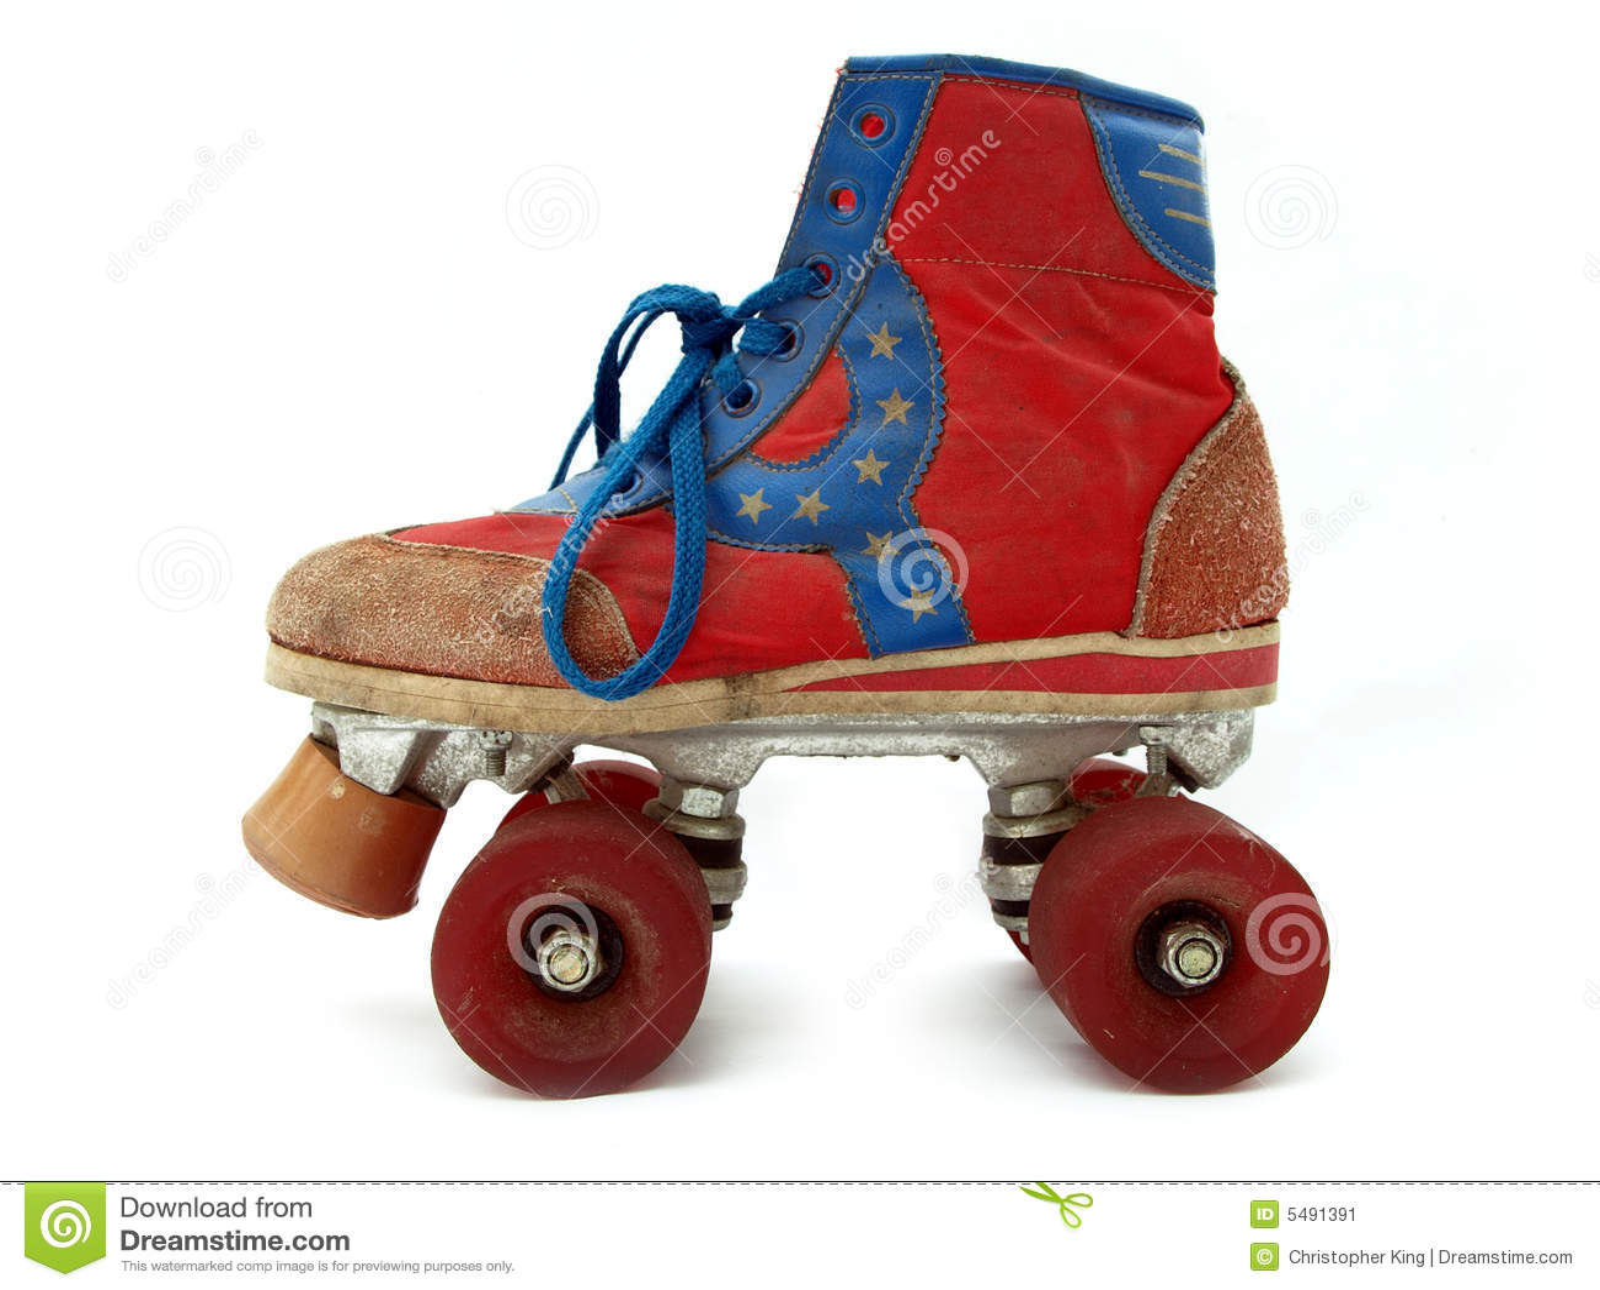 how to choose roller skates